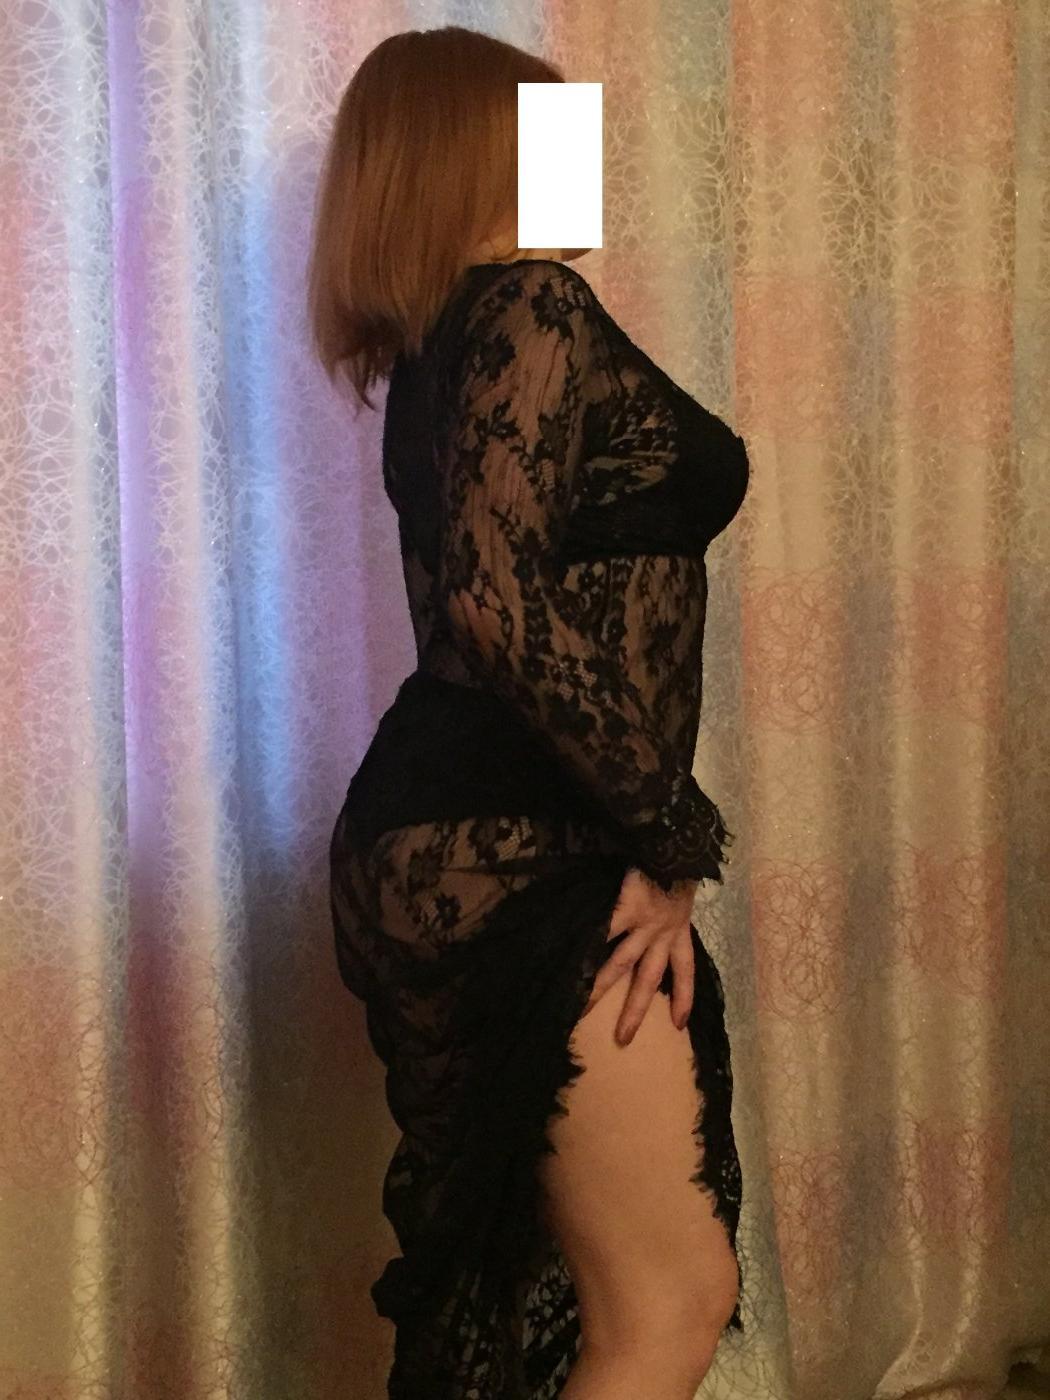 Проститутка Жасмина, 31 год, метро Нижегородская улица